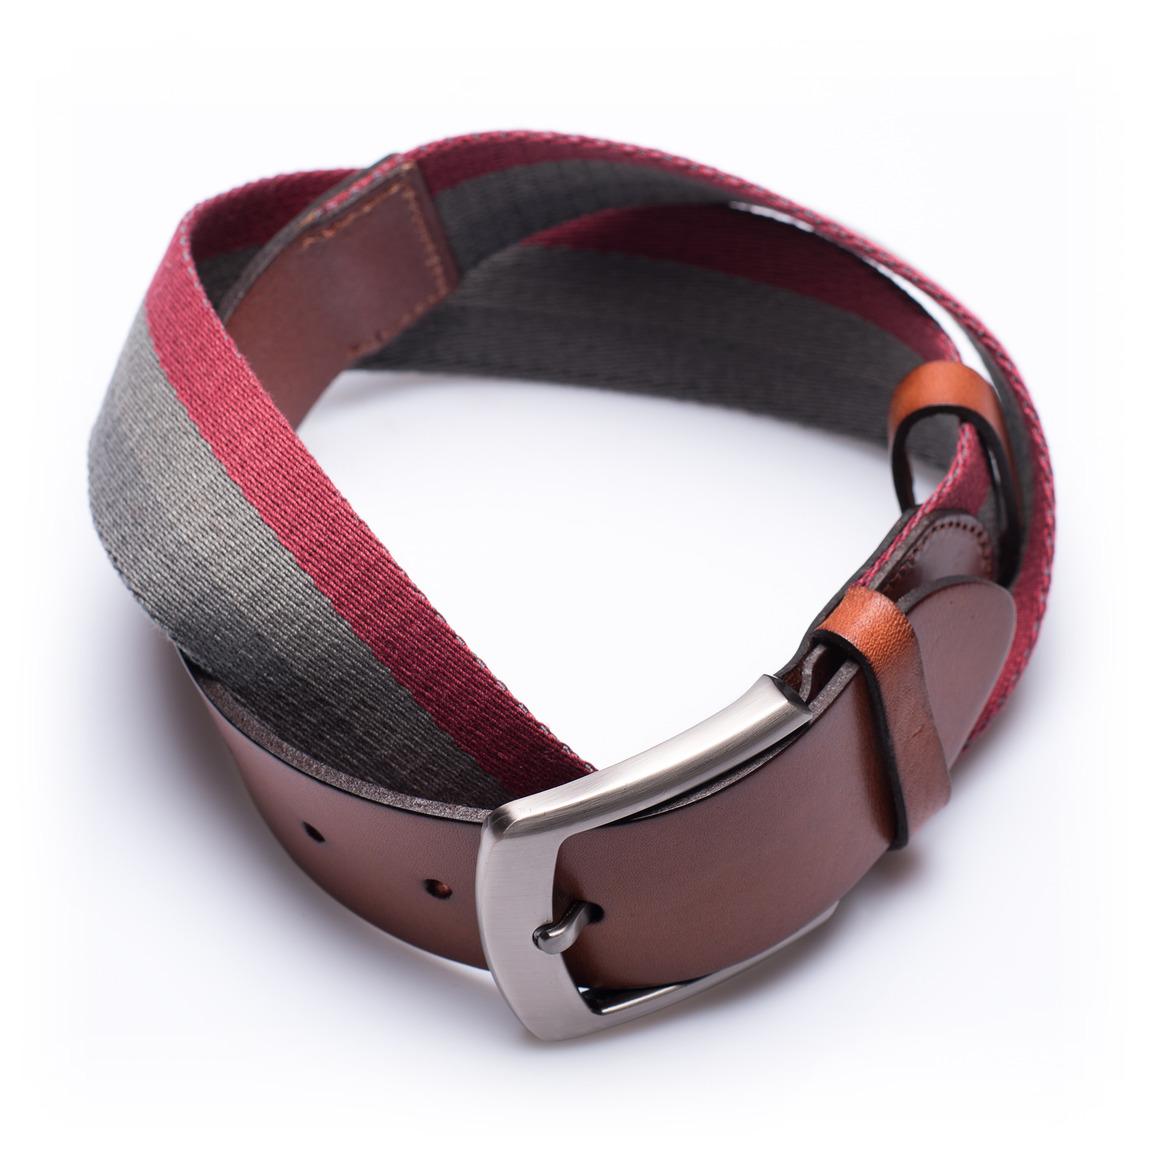 Preston Desert Sunrise - Leather and textile belt